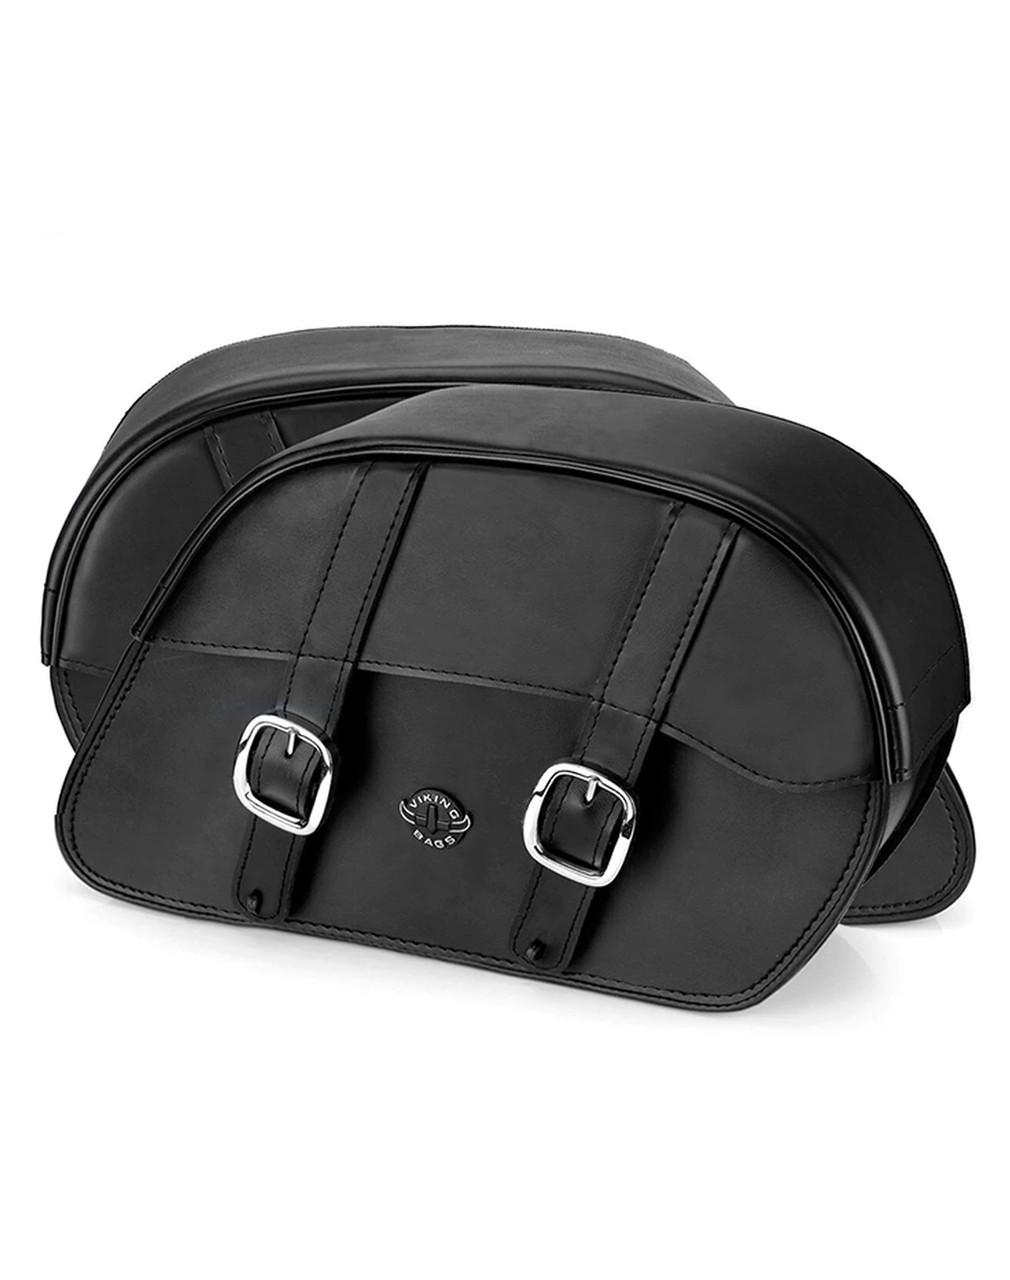 Viking Slanted Medium Motorcycle Saddlebags For Harley Dyna Switchback Both bags View